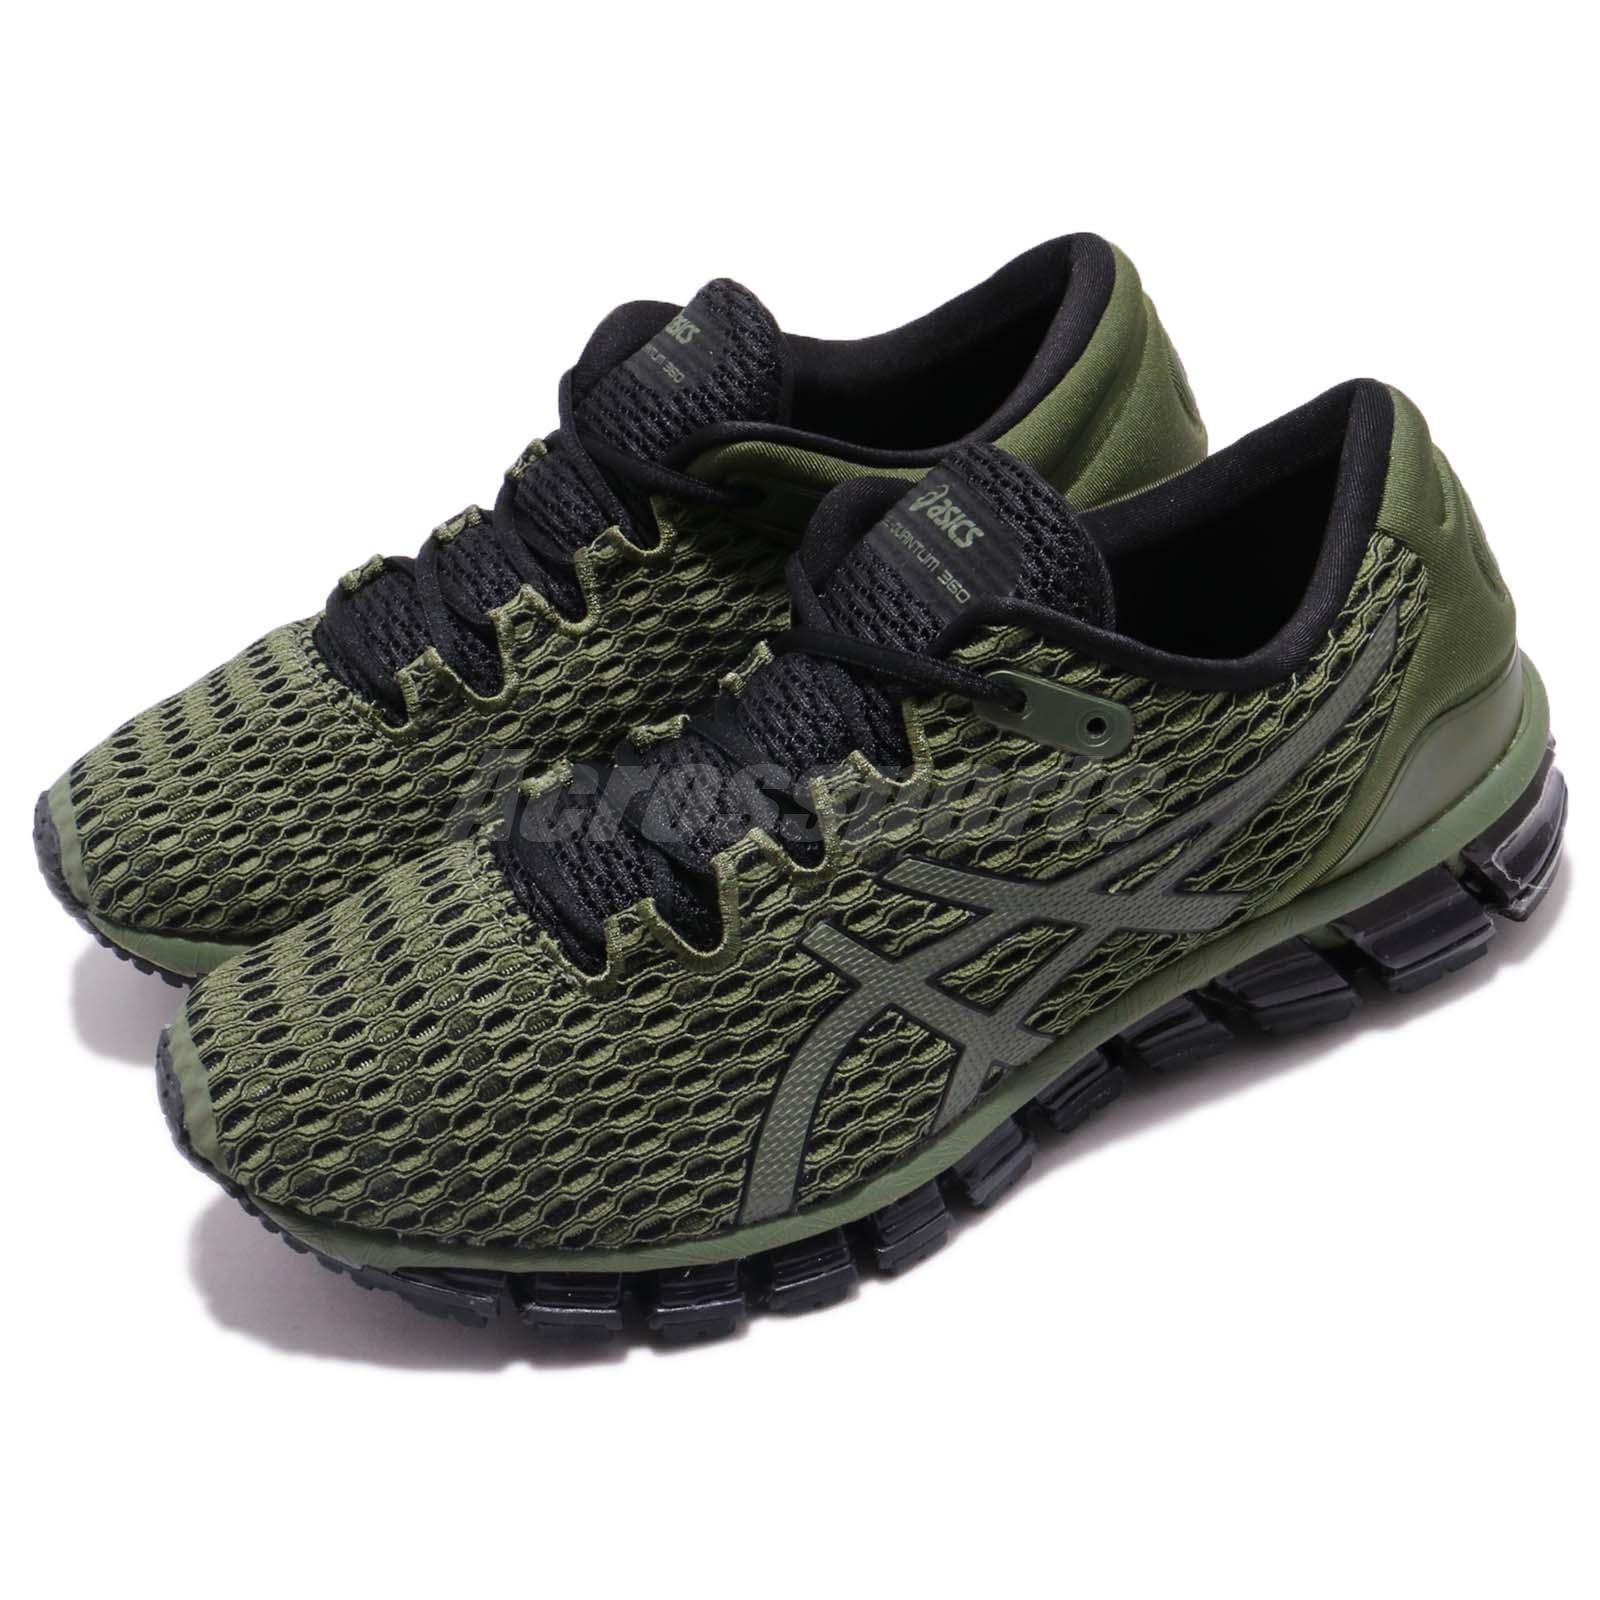 Asics Gel-Quantum 360 Shift Shift Shift MX Four Leaf verde Men Running zapatos T839N-8190 67719c